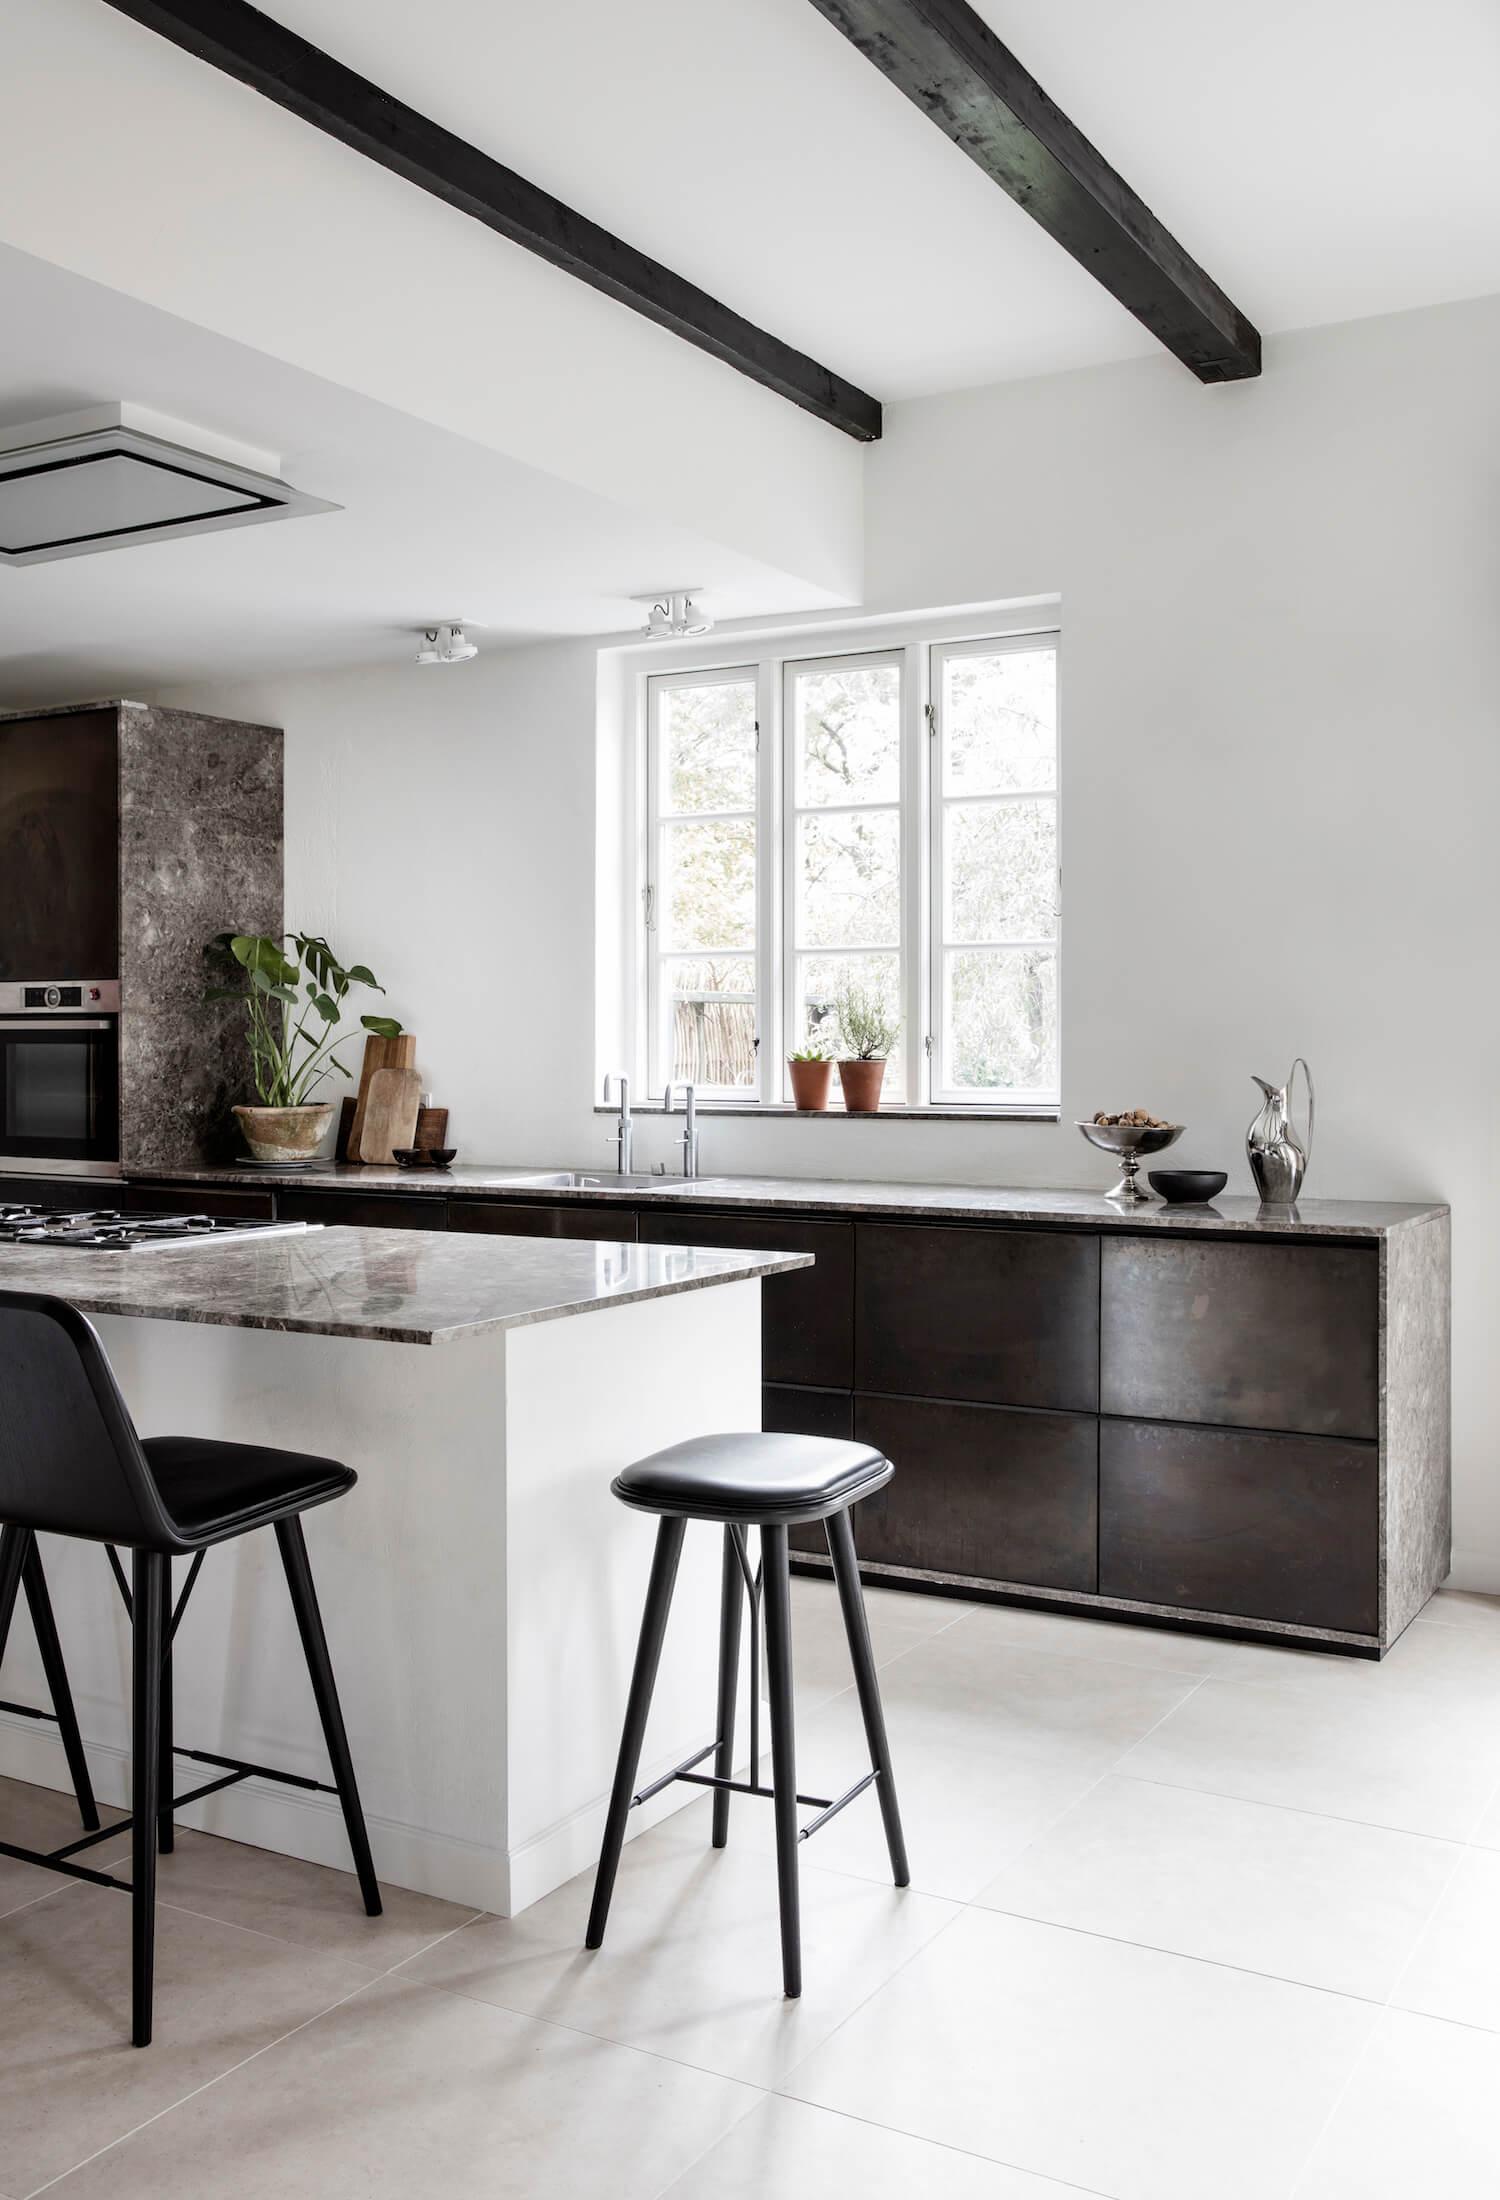 est living global interiors copenhagen home Kitchen8